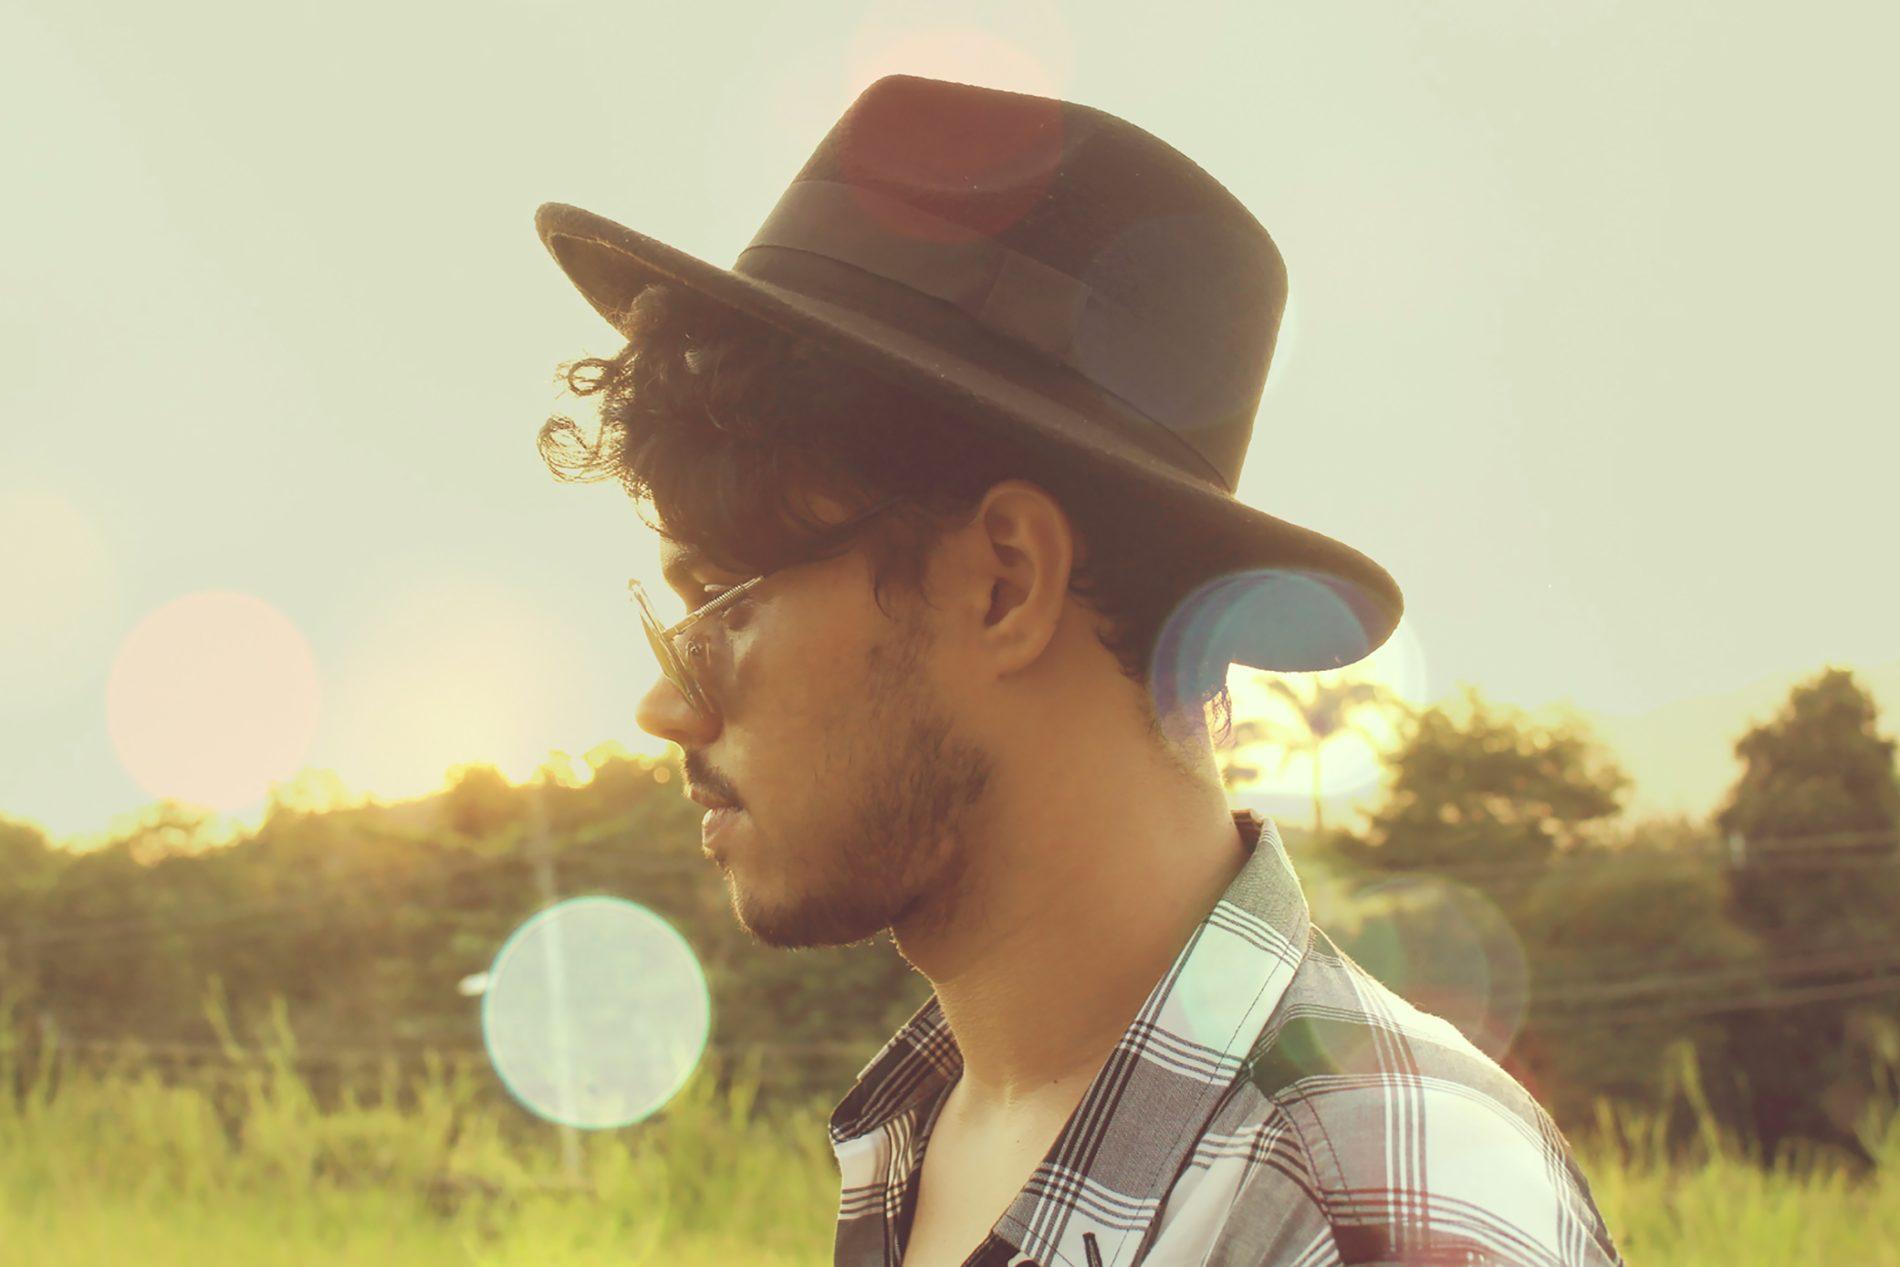 beautycare maschile: le tendenze barba